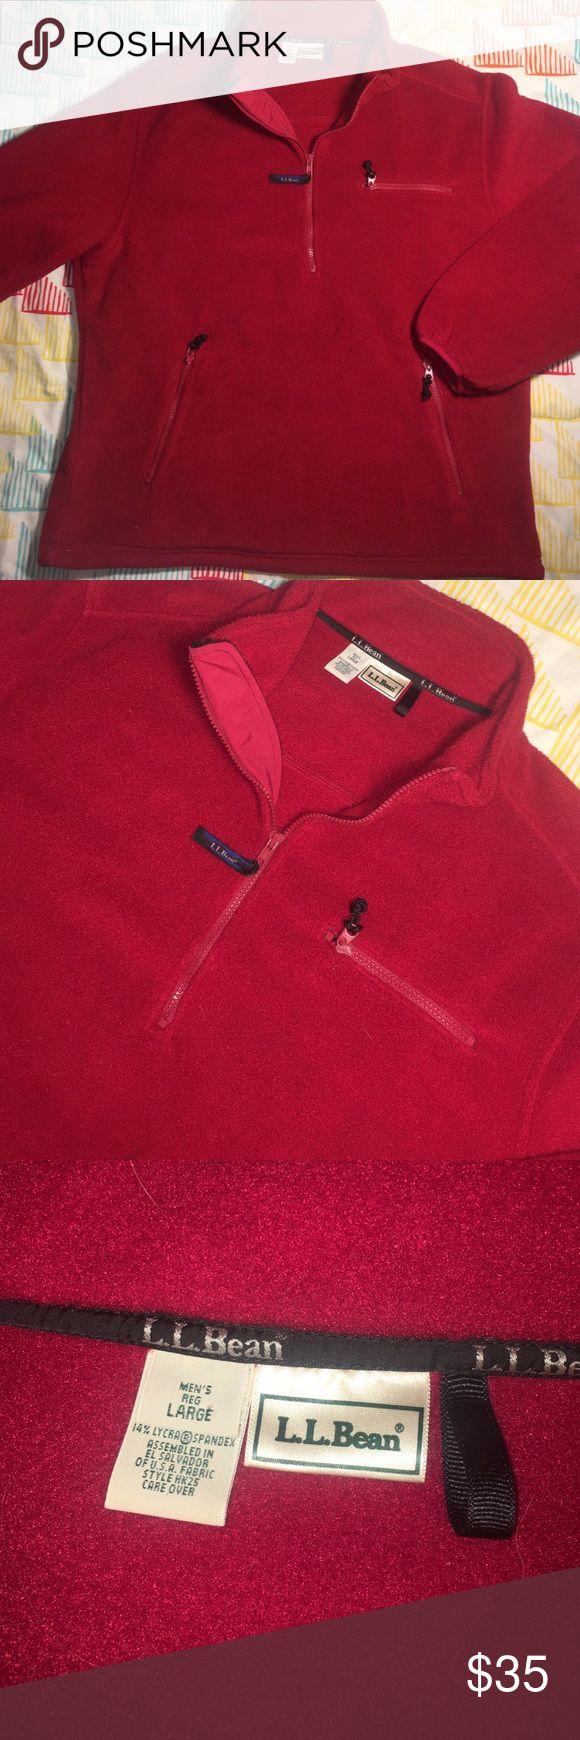 LL Bean Men's Large Pullover Soft Fleece Jacket Size Large - Like new L.L. Bean Jackets & Coats